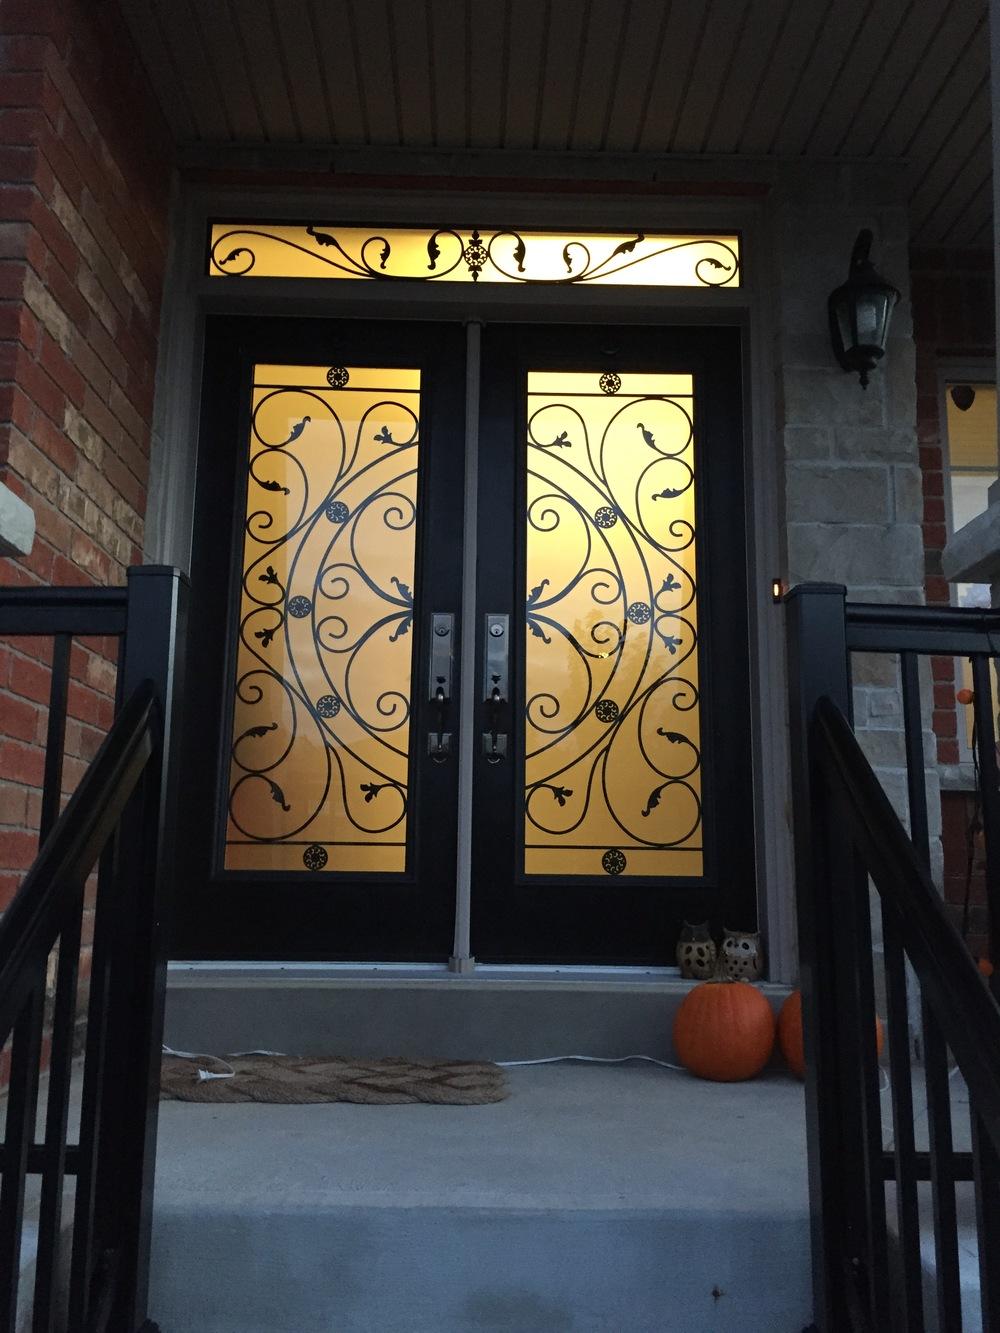 Campbellsford-Wrought-Iron-Glass-Door-Inserts-Richmond-Hill-Ontario